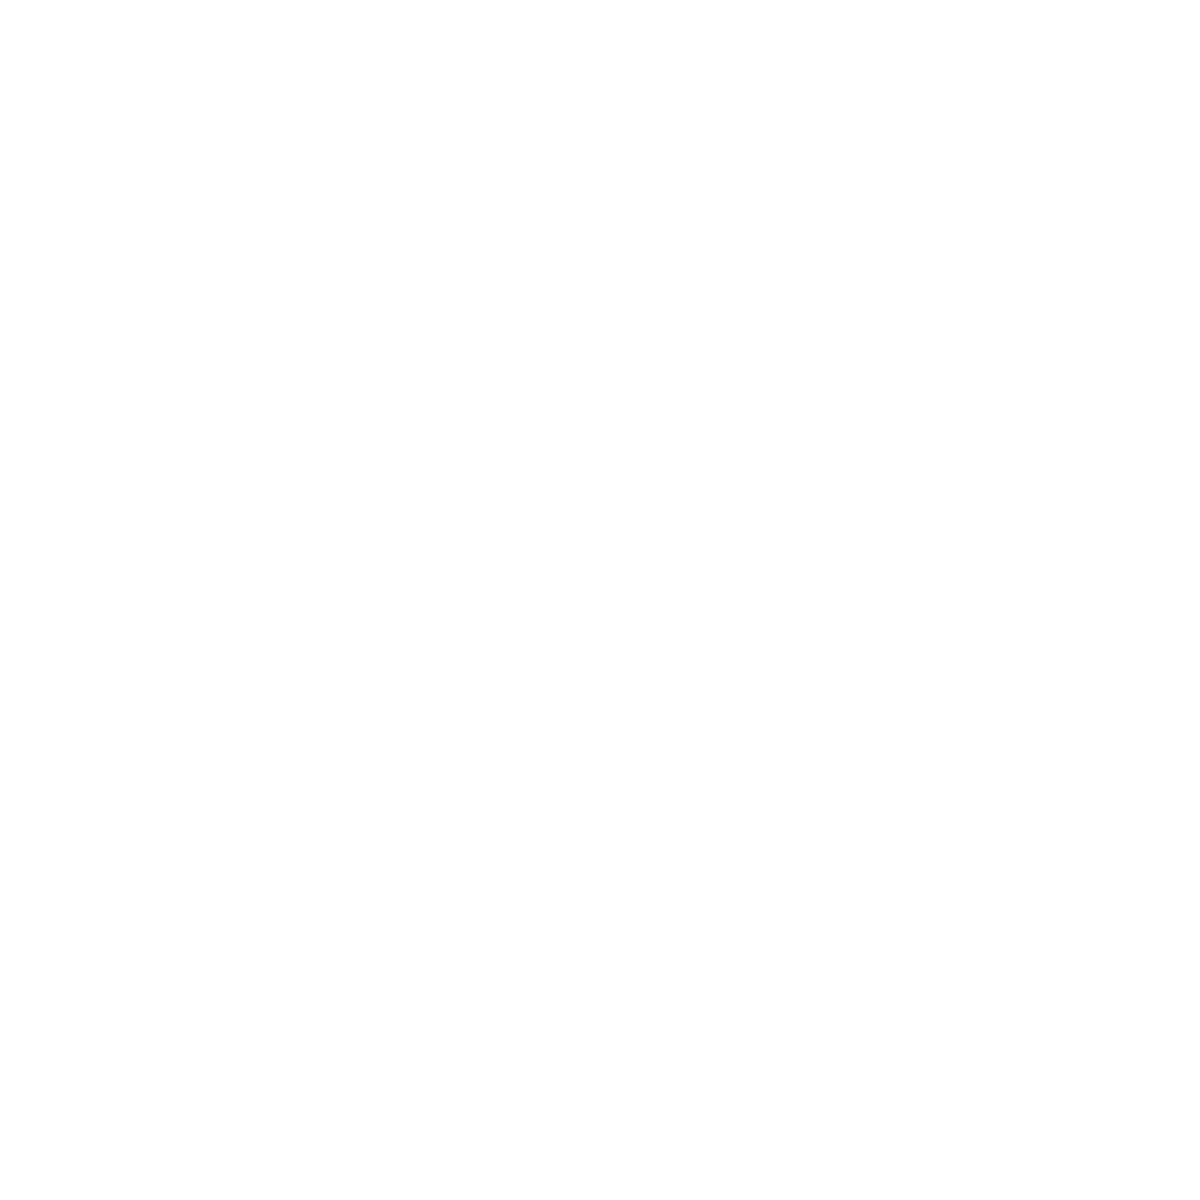 B2B-Logos-White_0032_51LGj5--KsL.png